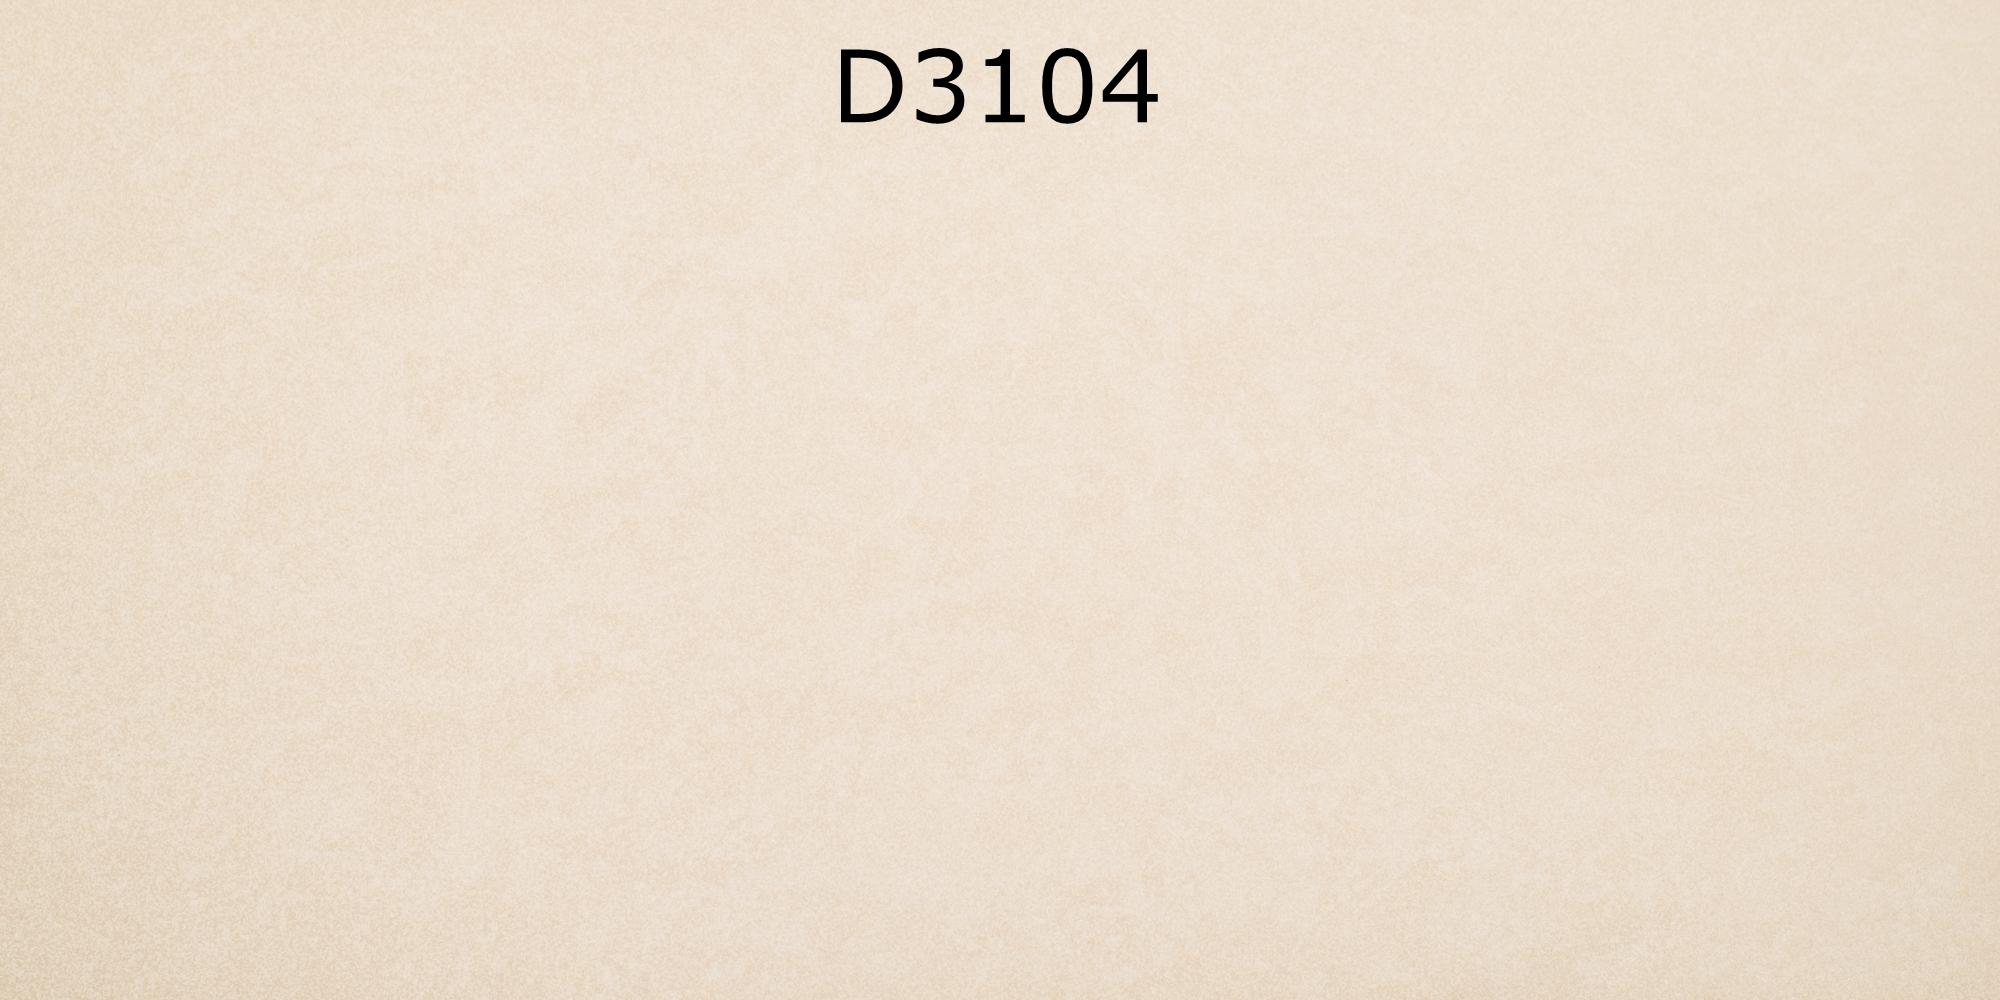 D3104